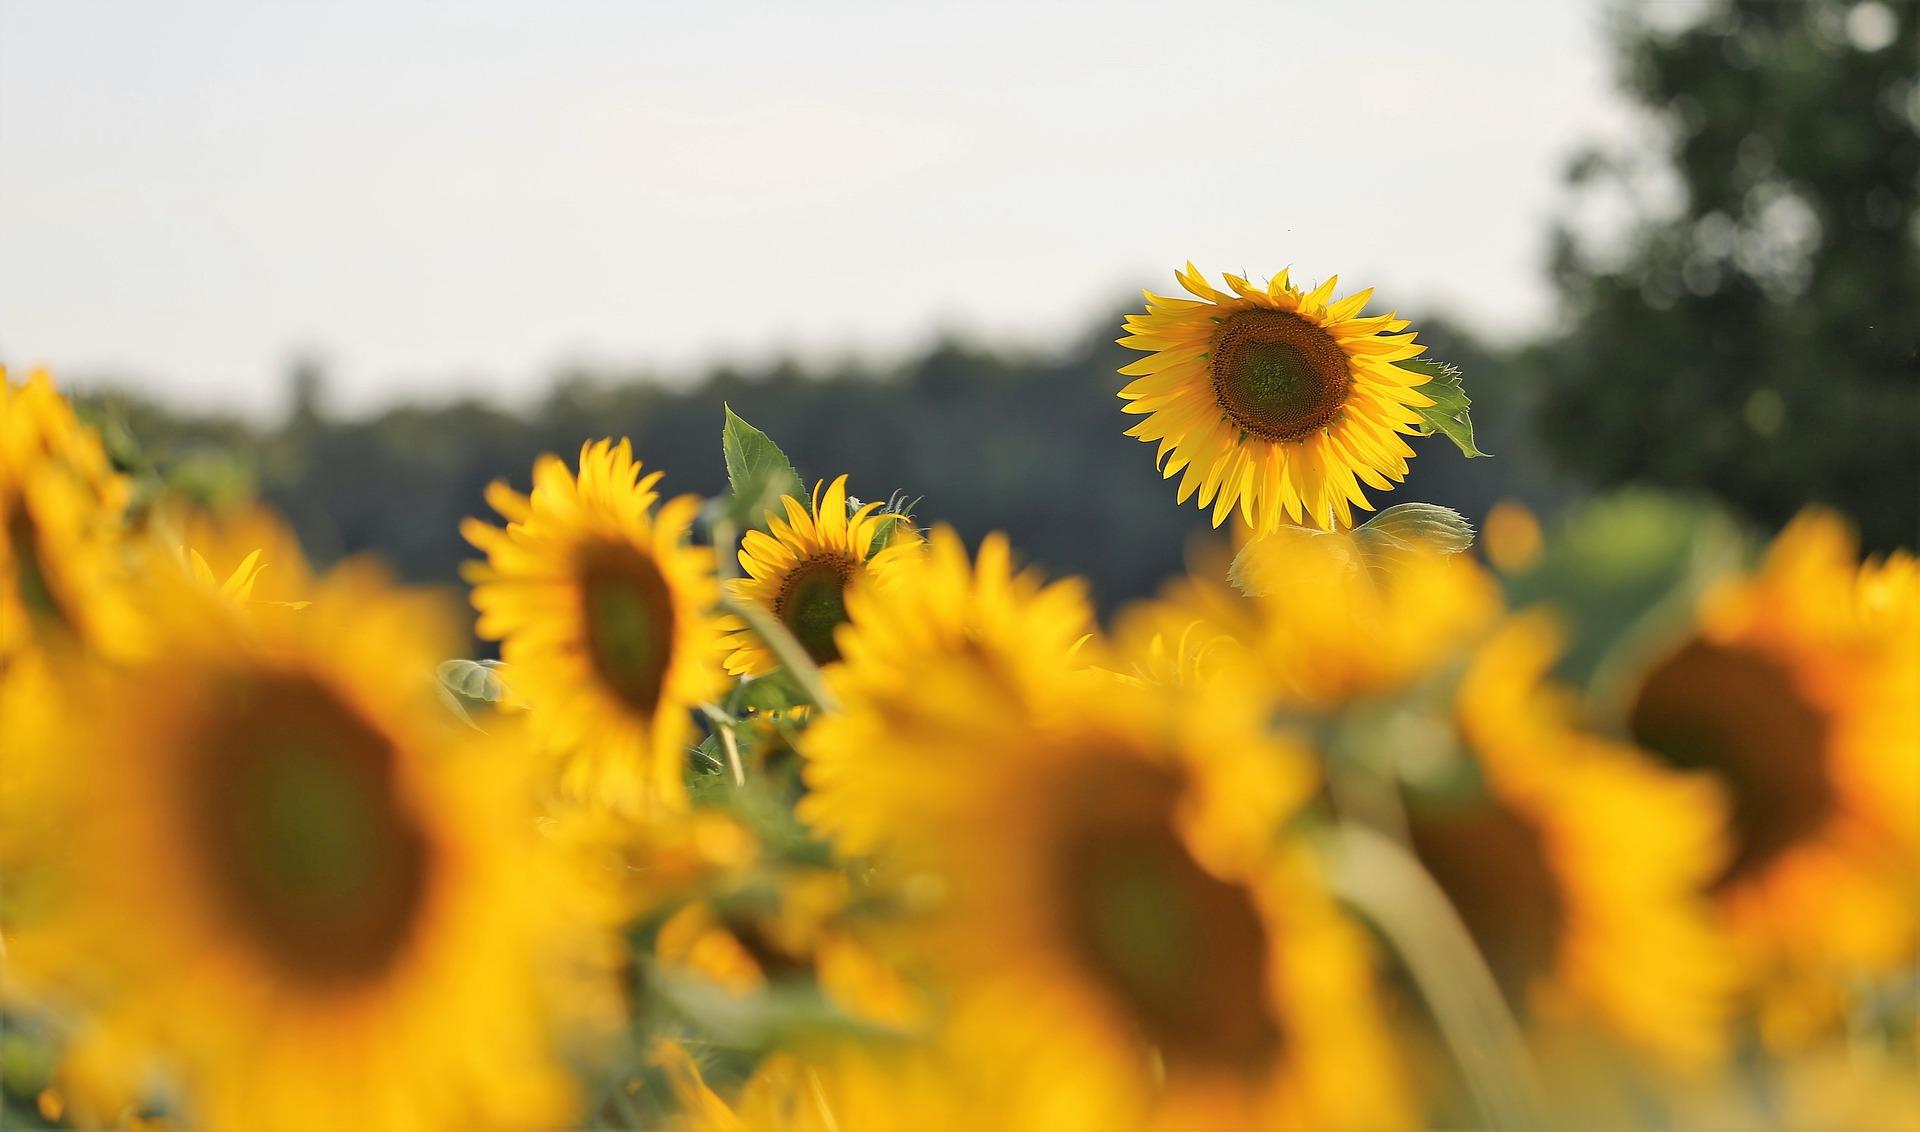 Украина увеличила производство подсолнечного масла на 15%